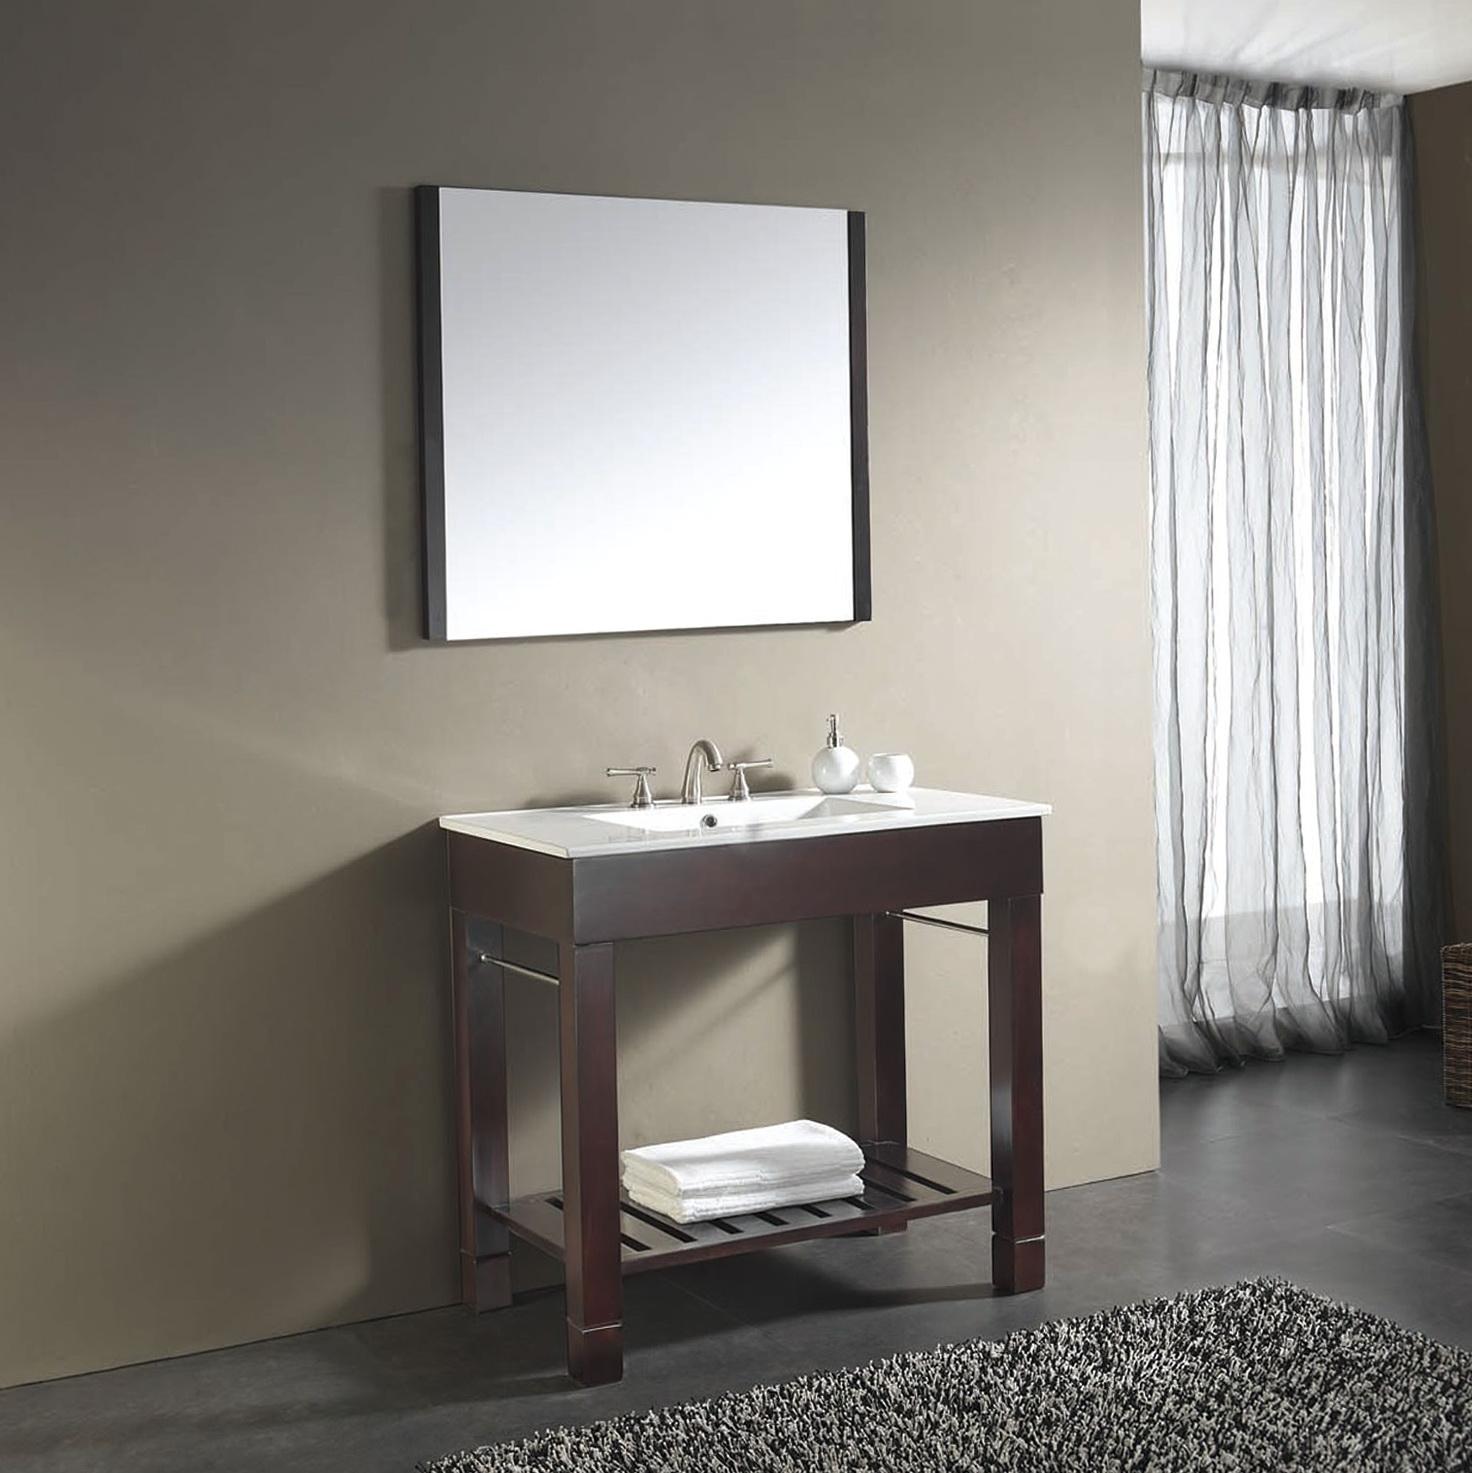 Standard Bathroom Vanity Height